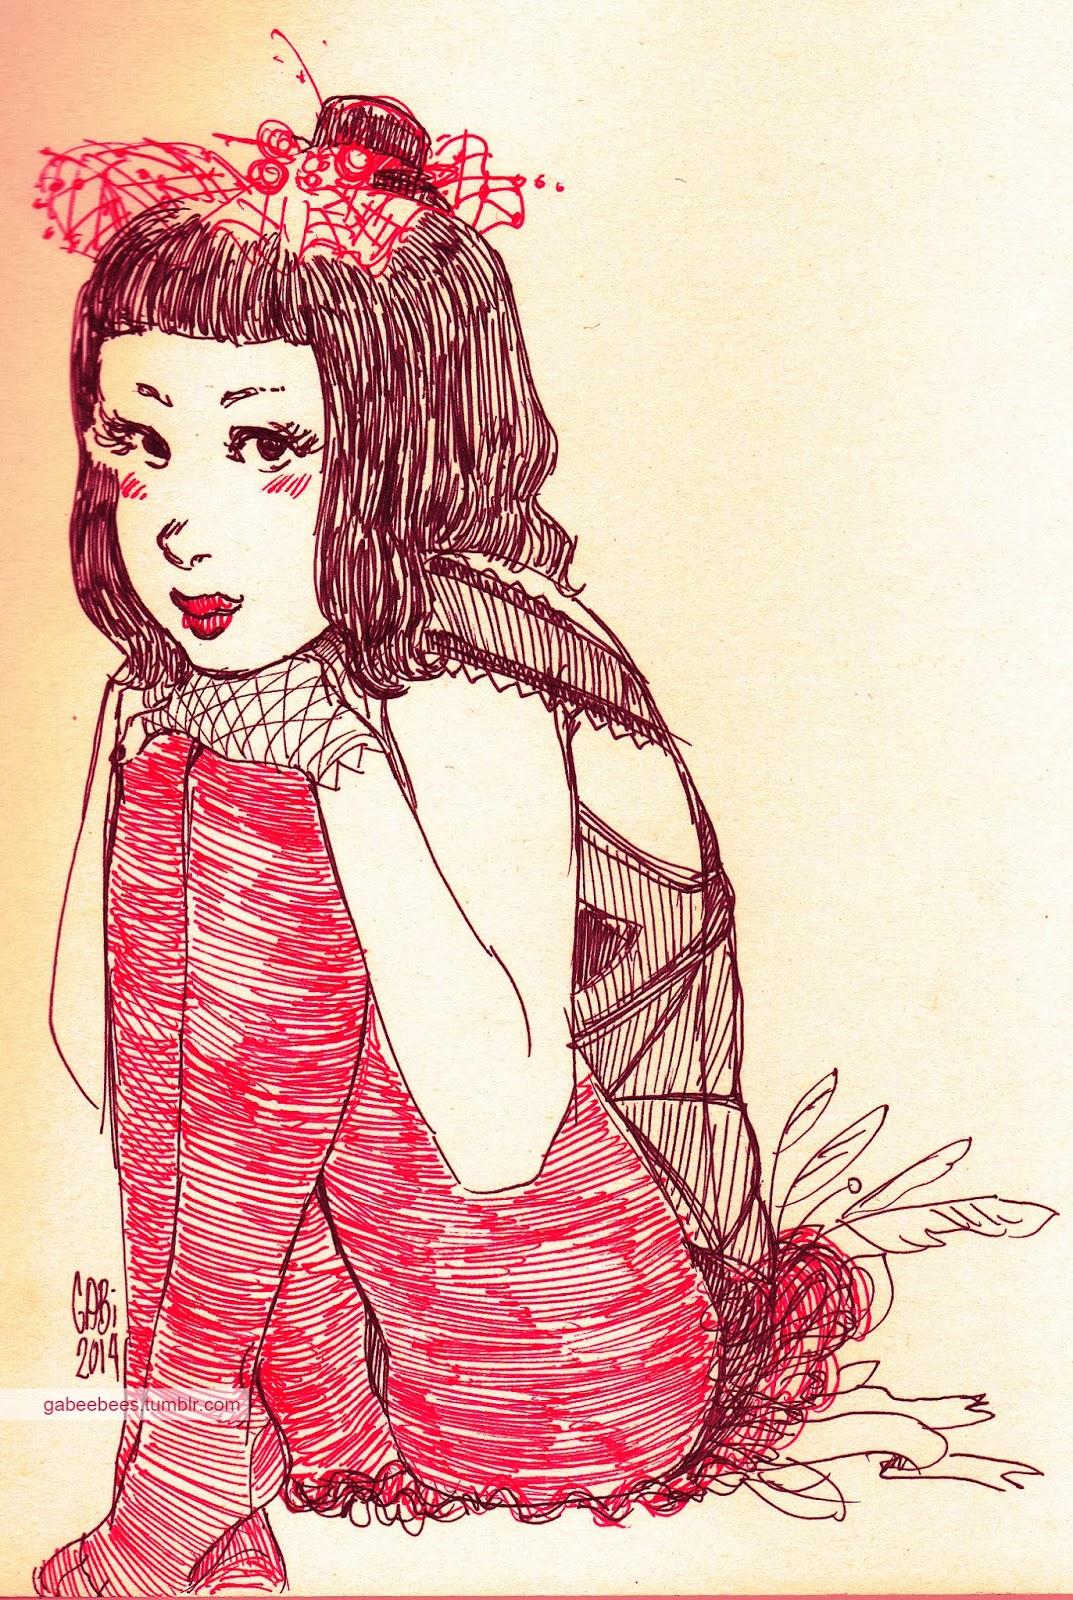 Sinigang Sa Gabi Beautiful Girlsand The Bleeding Effect-9252